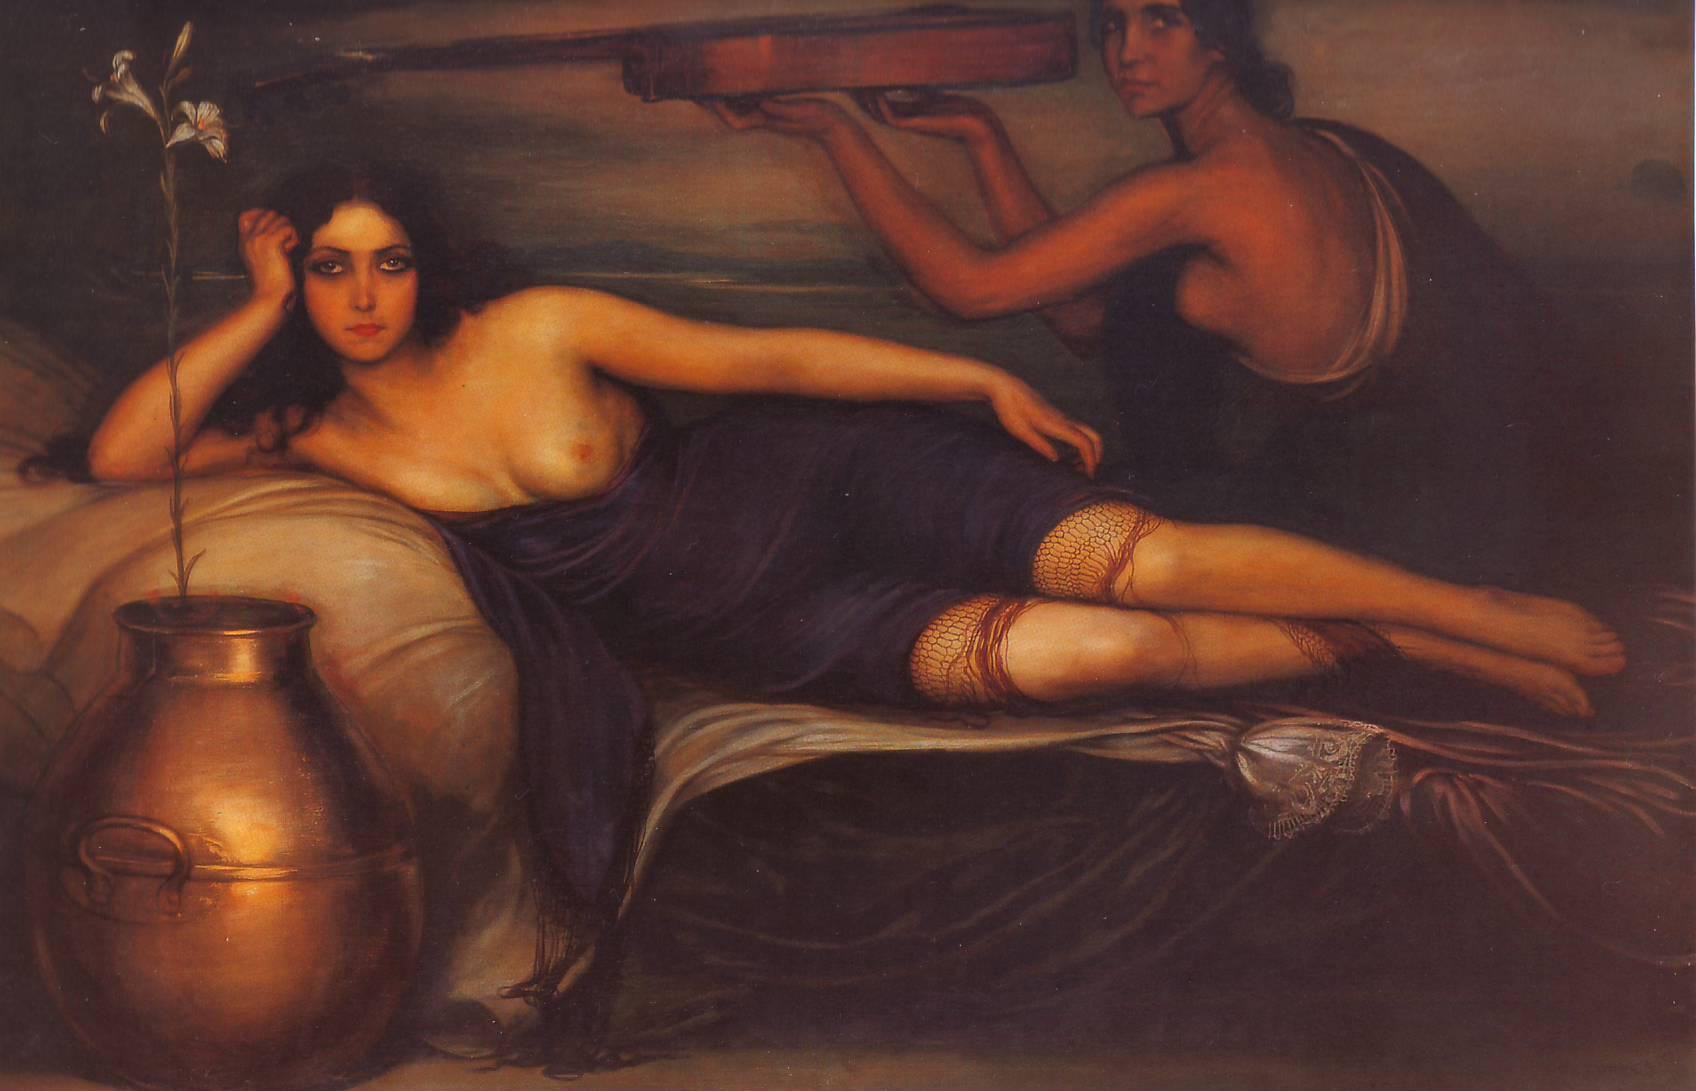 http://upload.wikimedia.org/wikipedia/commons/6/63/Julio_Romero_de_Torres_-_Muxidora_1922.JPG